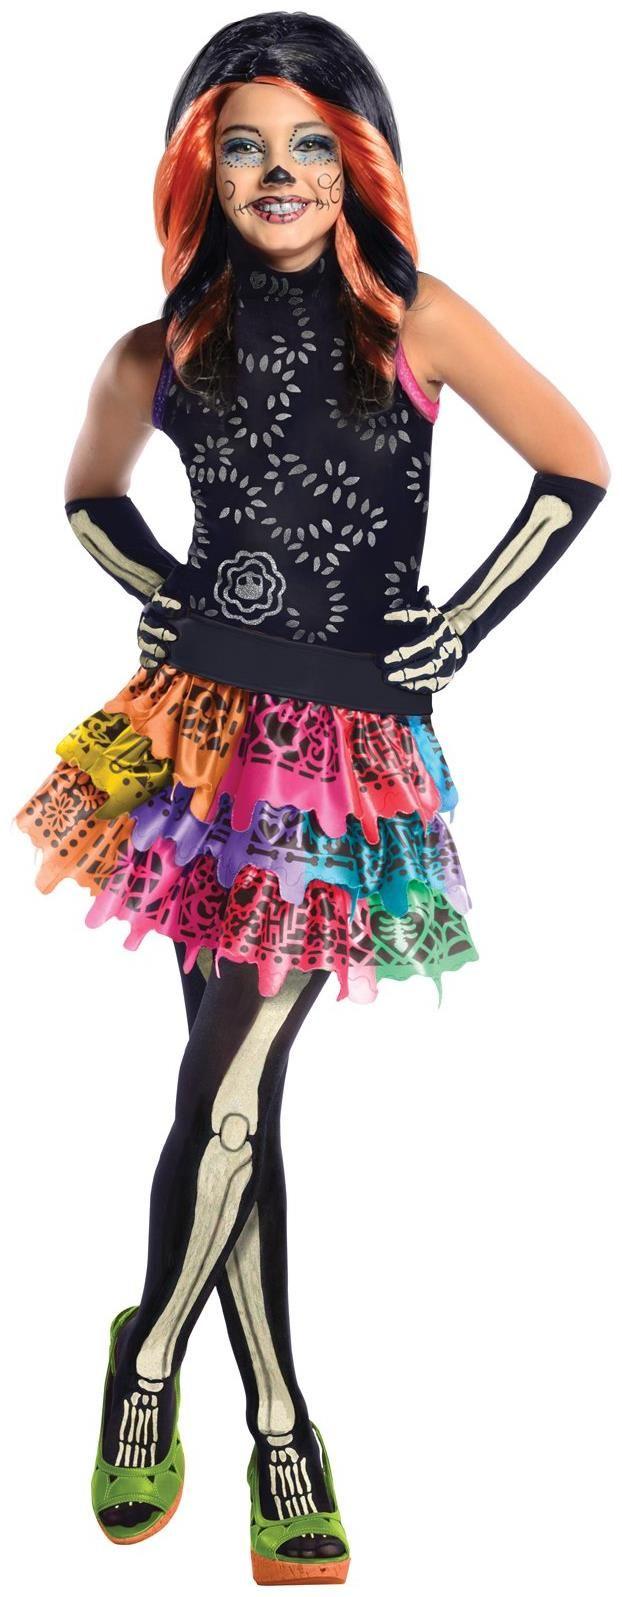 monster high skelita calaveras child costume | monster high costumes